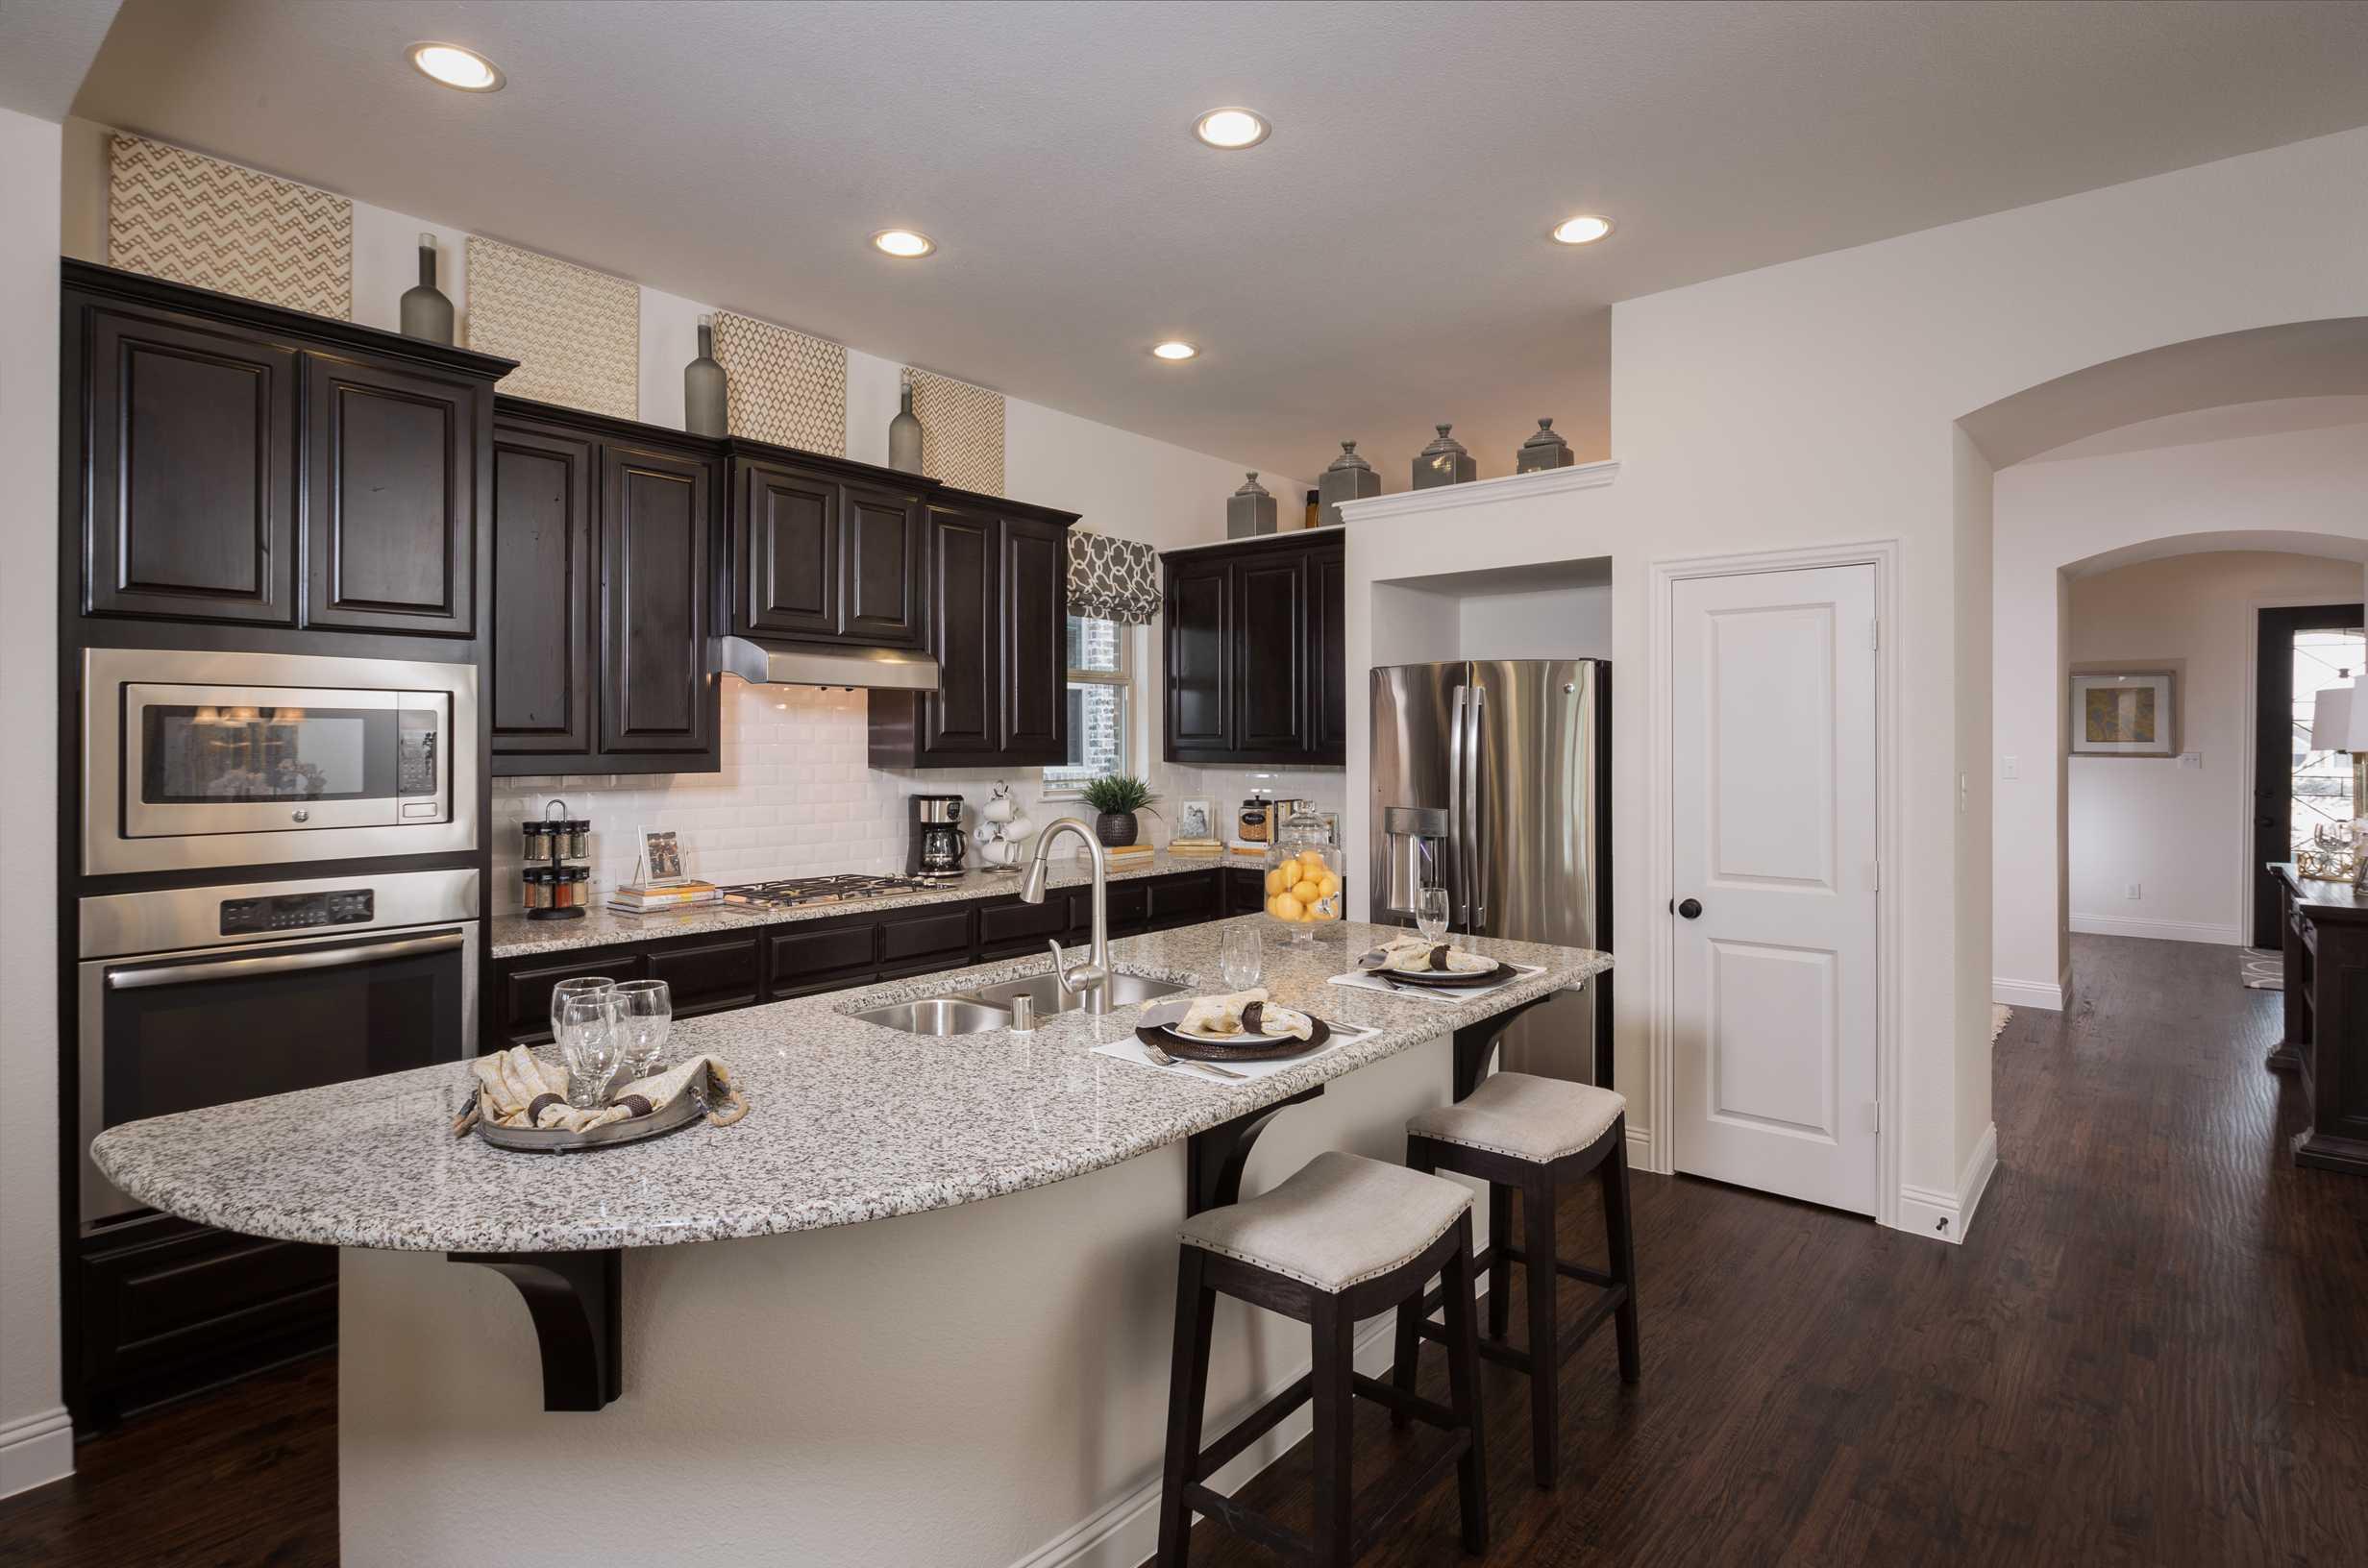 Kitchen-in-Plan 511T-at-Ventana: 55ft. lots-in-Bulverde